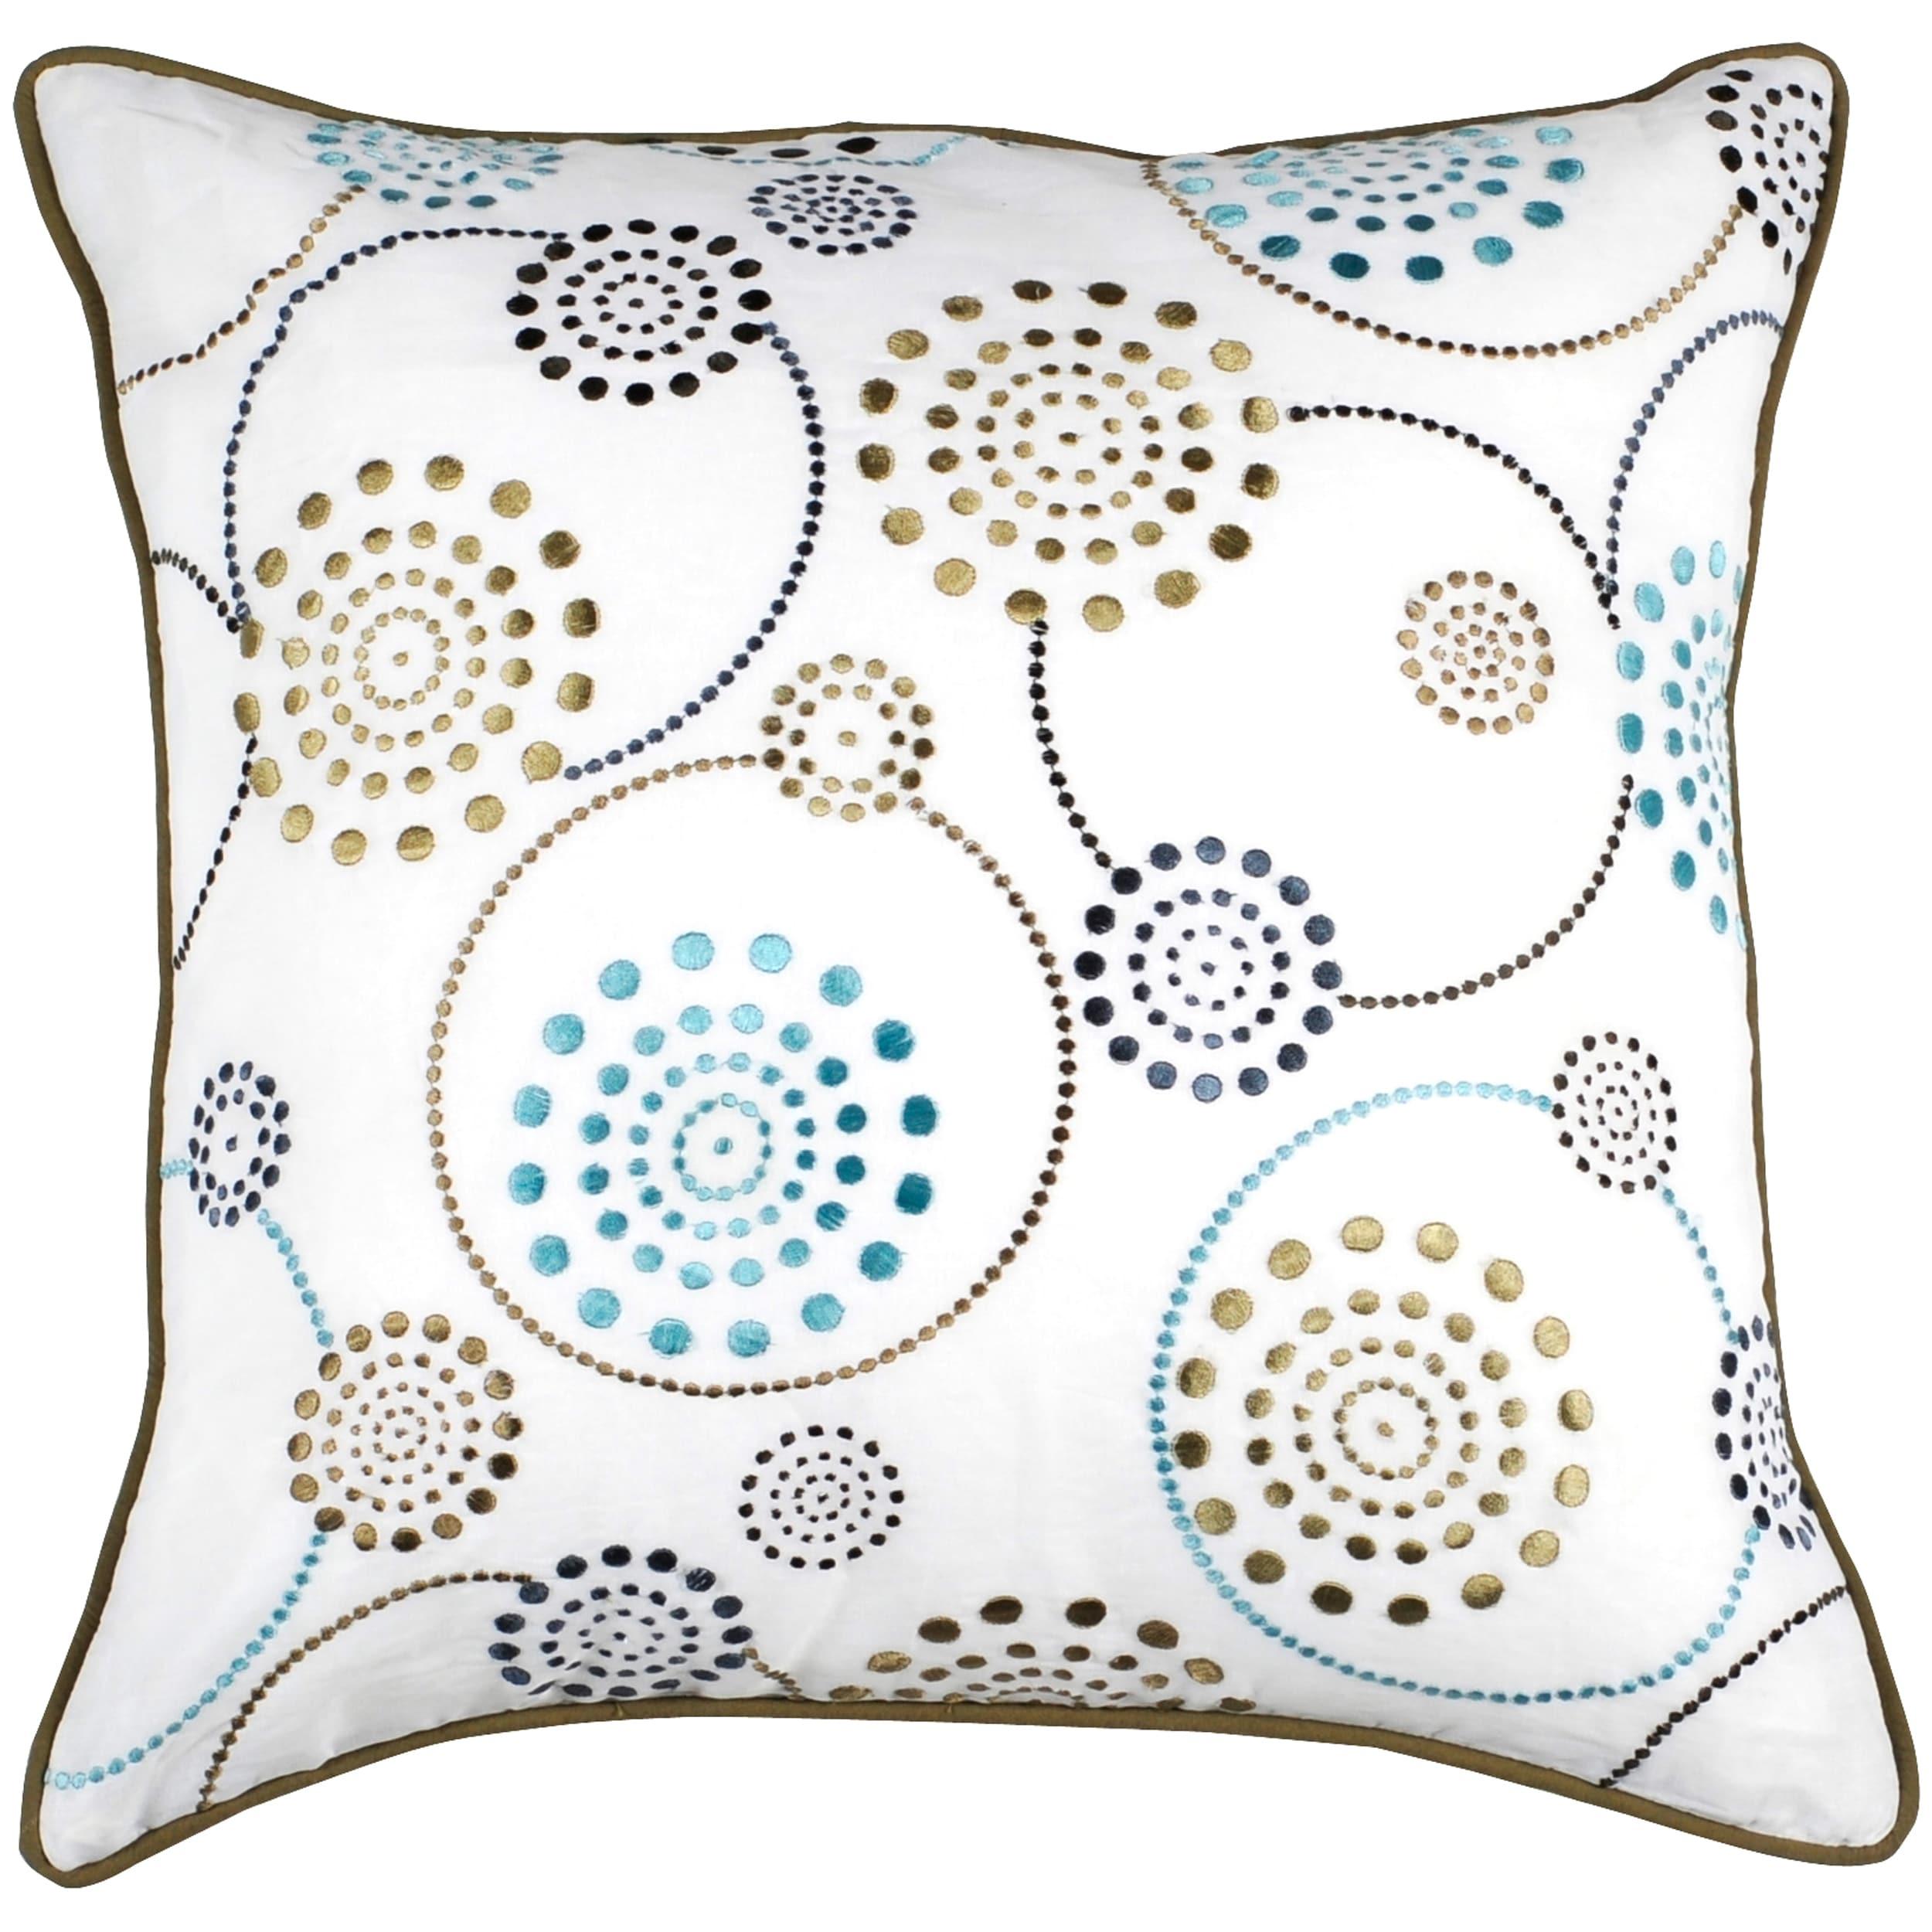 Modern Circles Multicolored 22x22 Decor Pillow